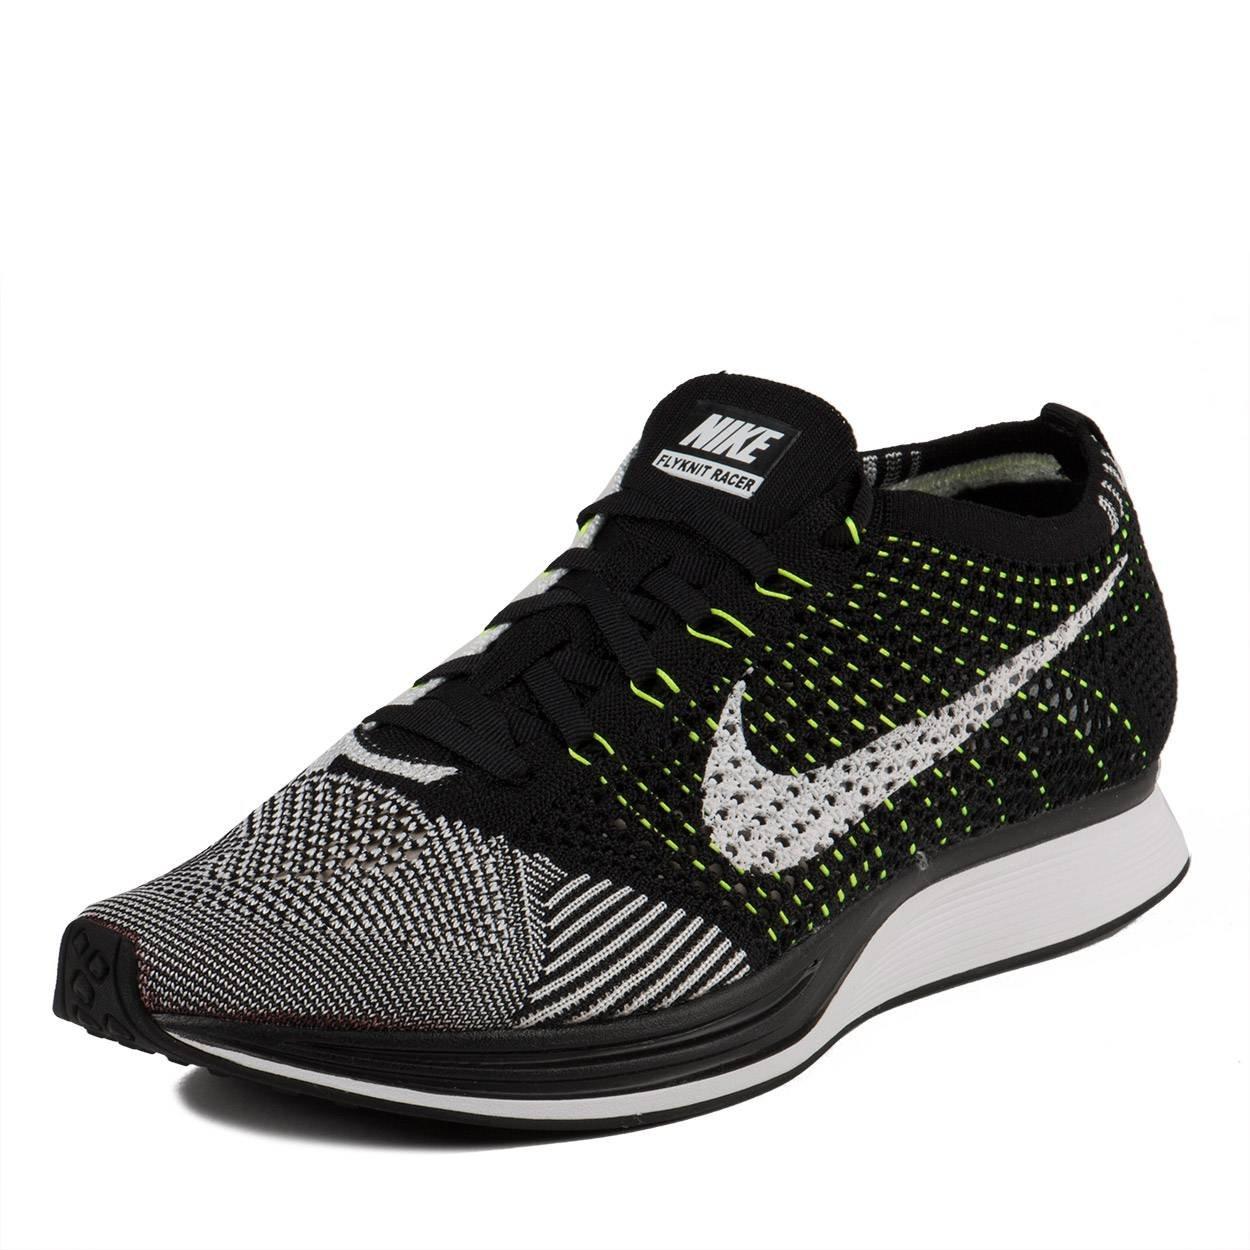 8aec101d20ca1 Galleon - Nike Flyknit Racer - 526628 011